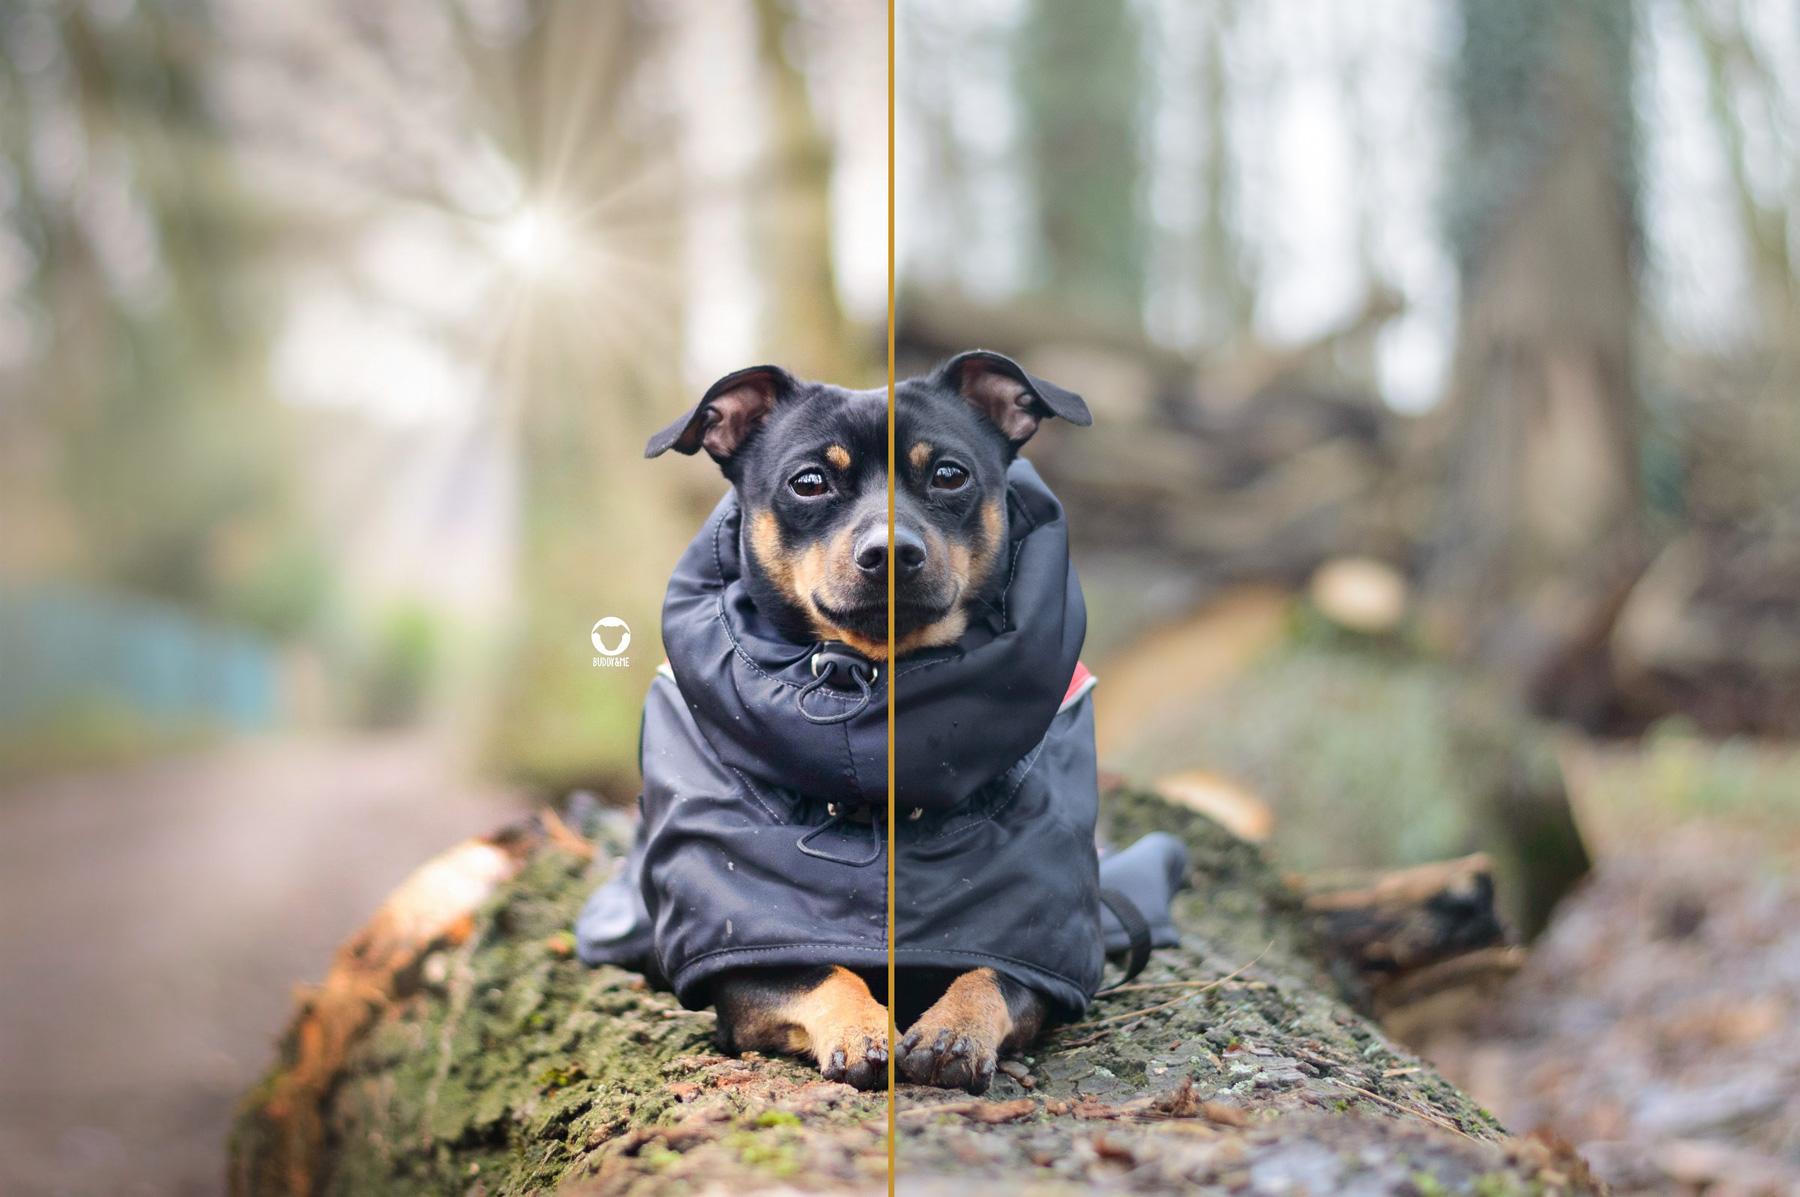 Pinscher Buddy, Buddy and Me, Hundeblog, Dogblog, Bildbearbeitung, Fotografie, Hundefotografie, Nikon, Luminar 3